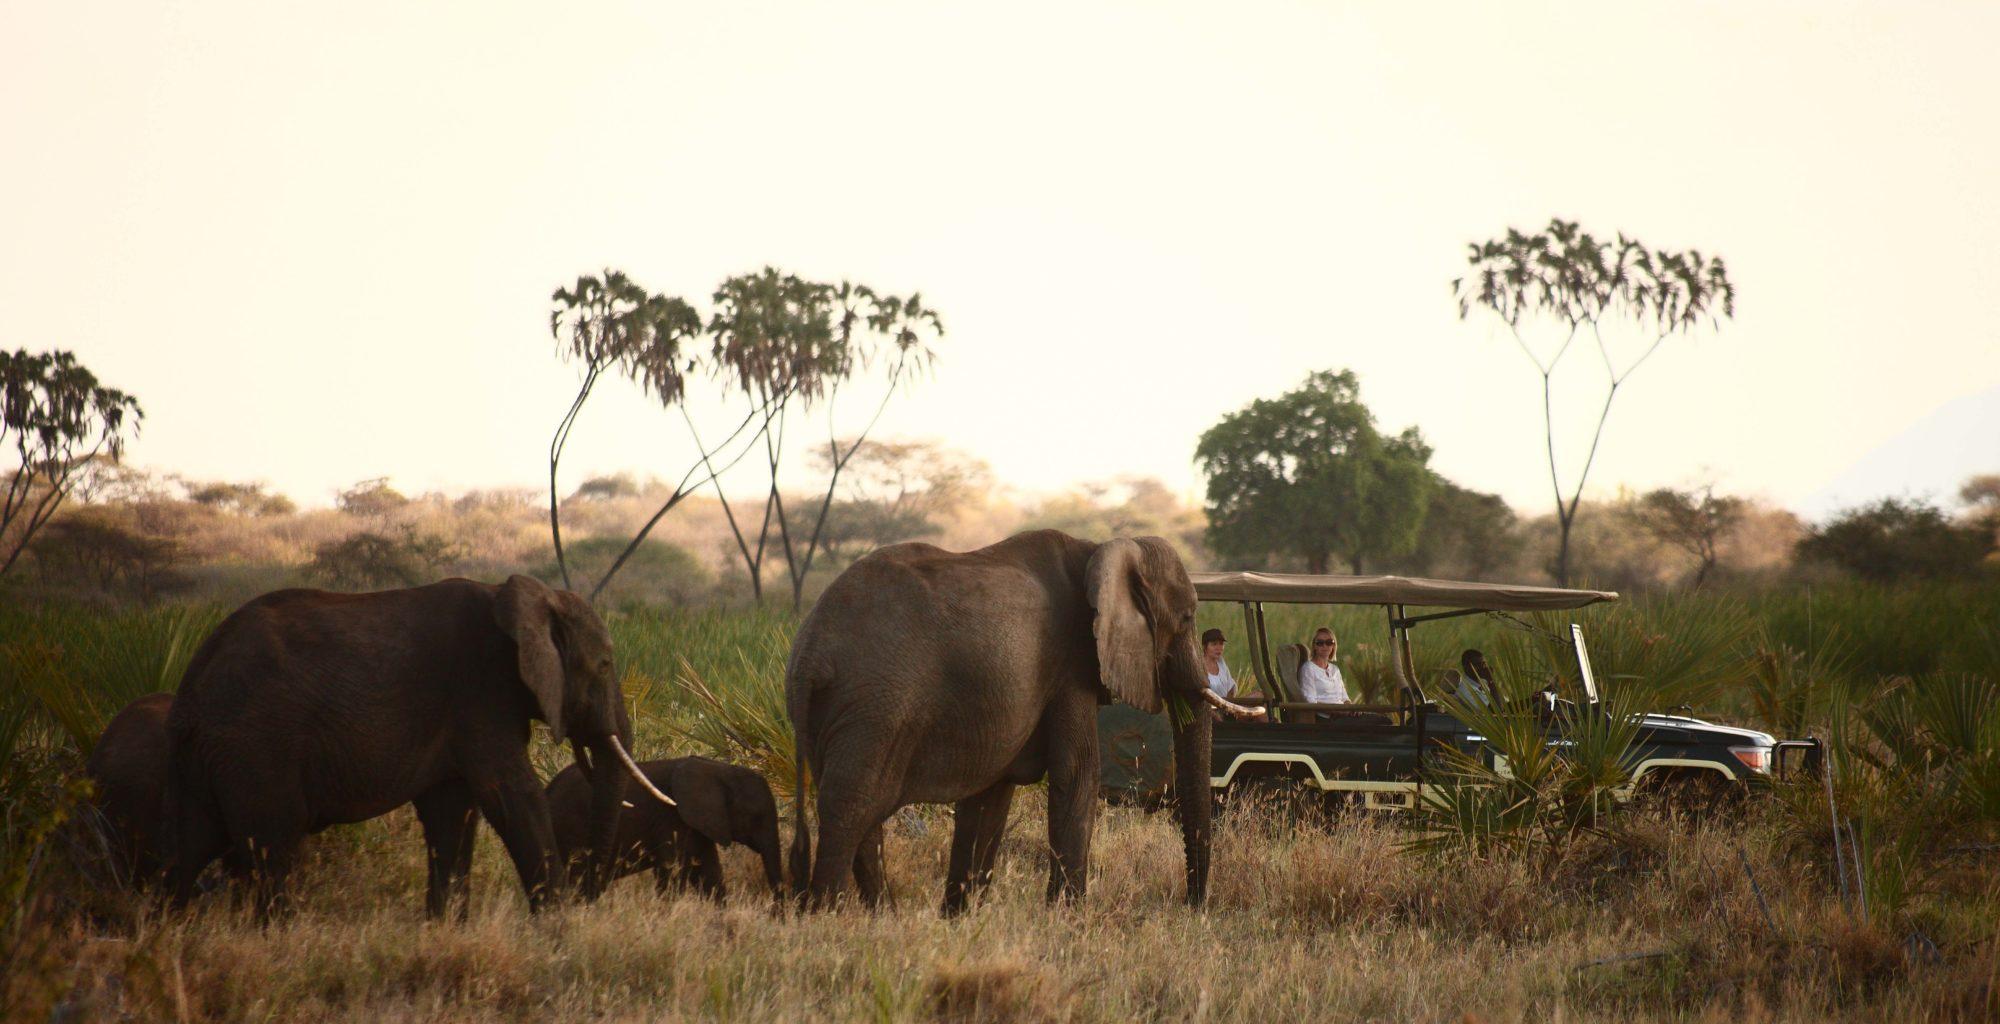 Kenya-Meru-National-Park-Wildlife-Elephant